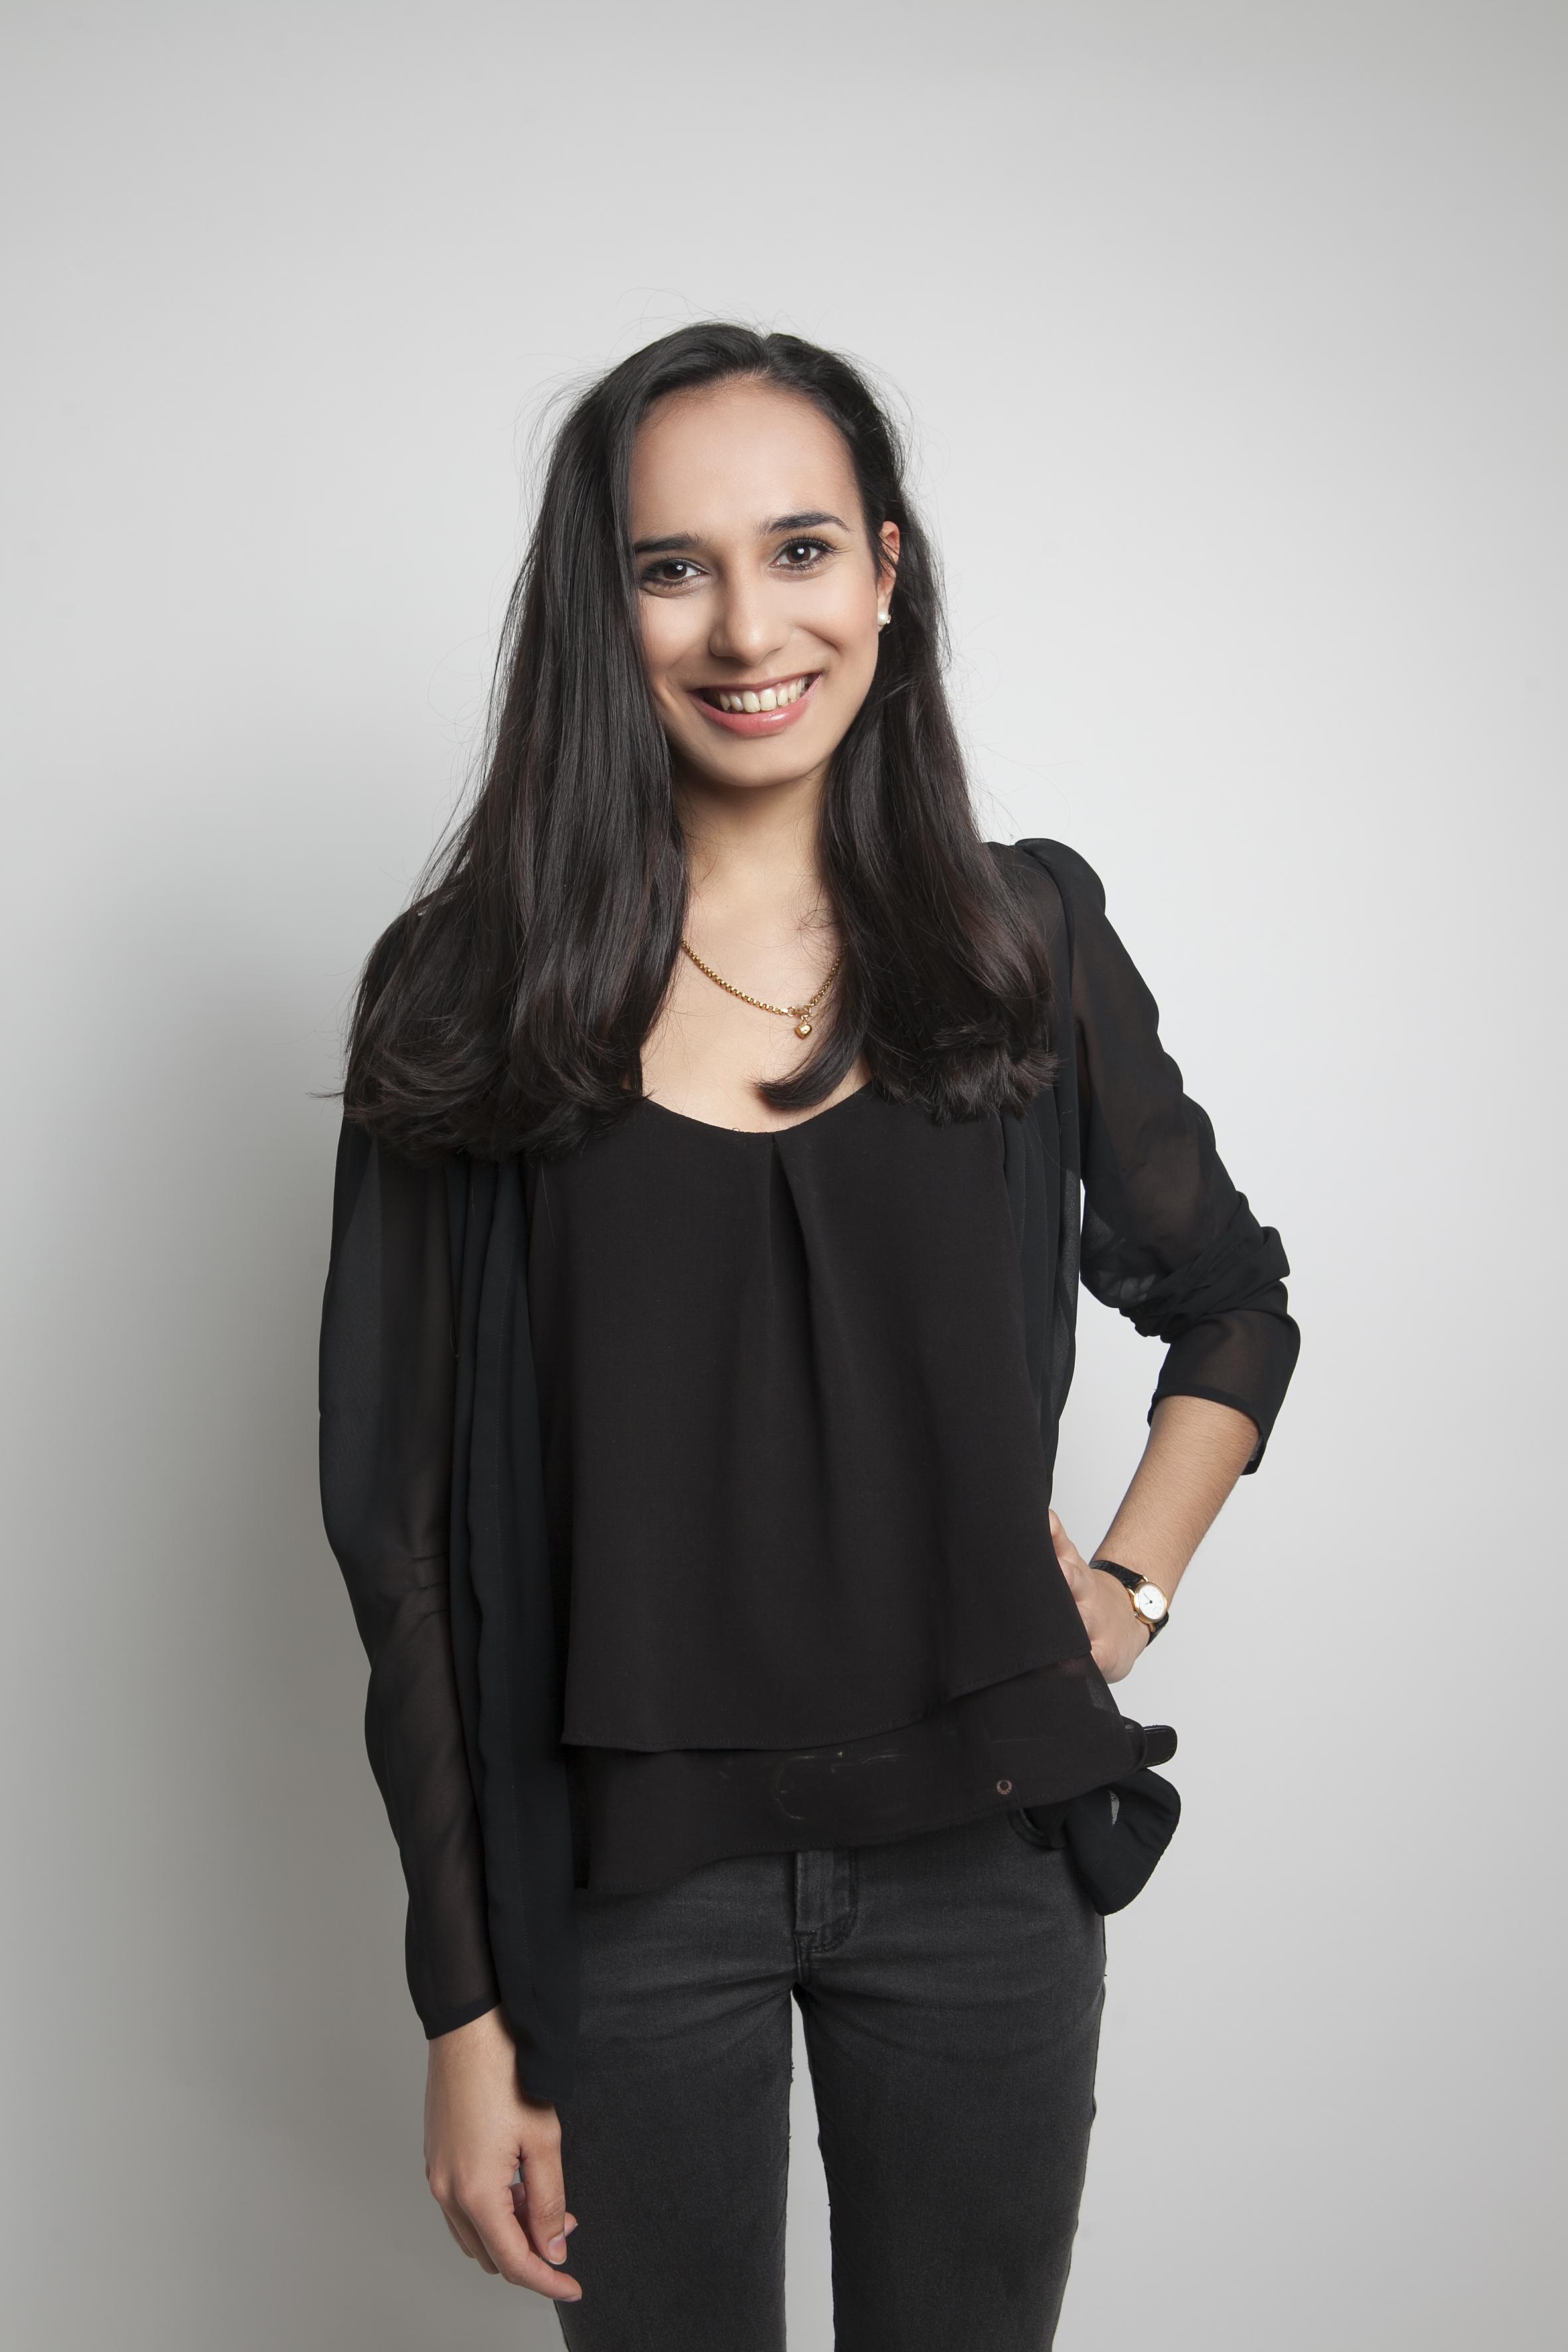 Julia Mayrdorfer